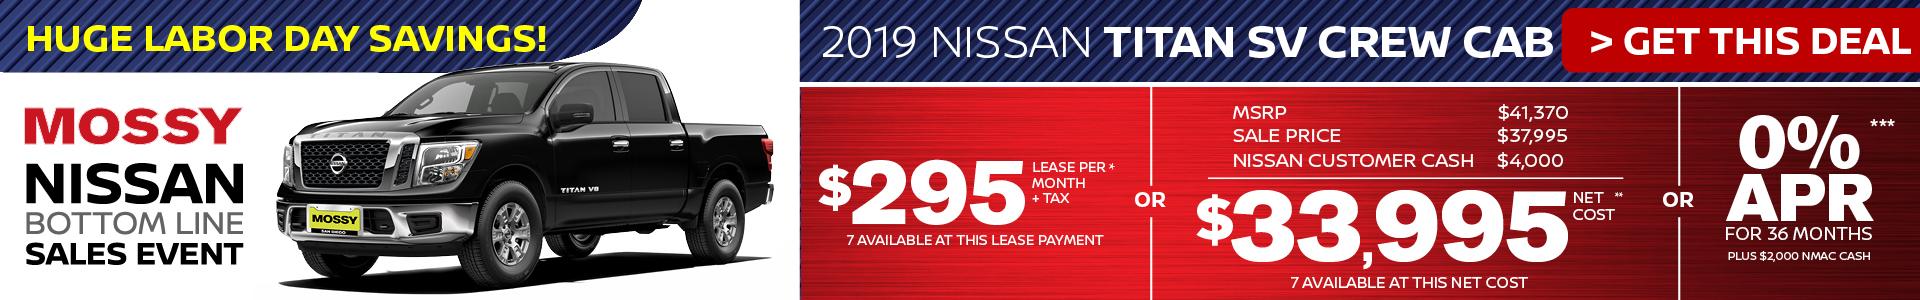 Mossy Nissan - Nissan Titan $33,995 Purchase